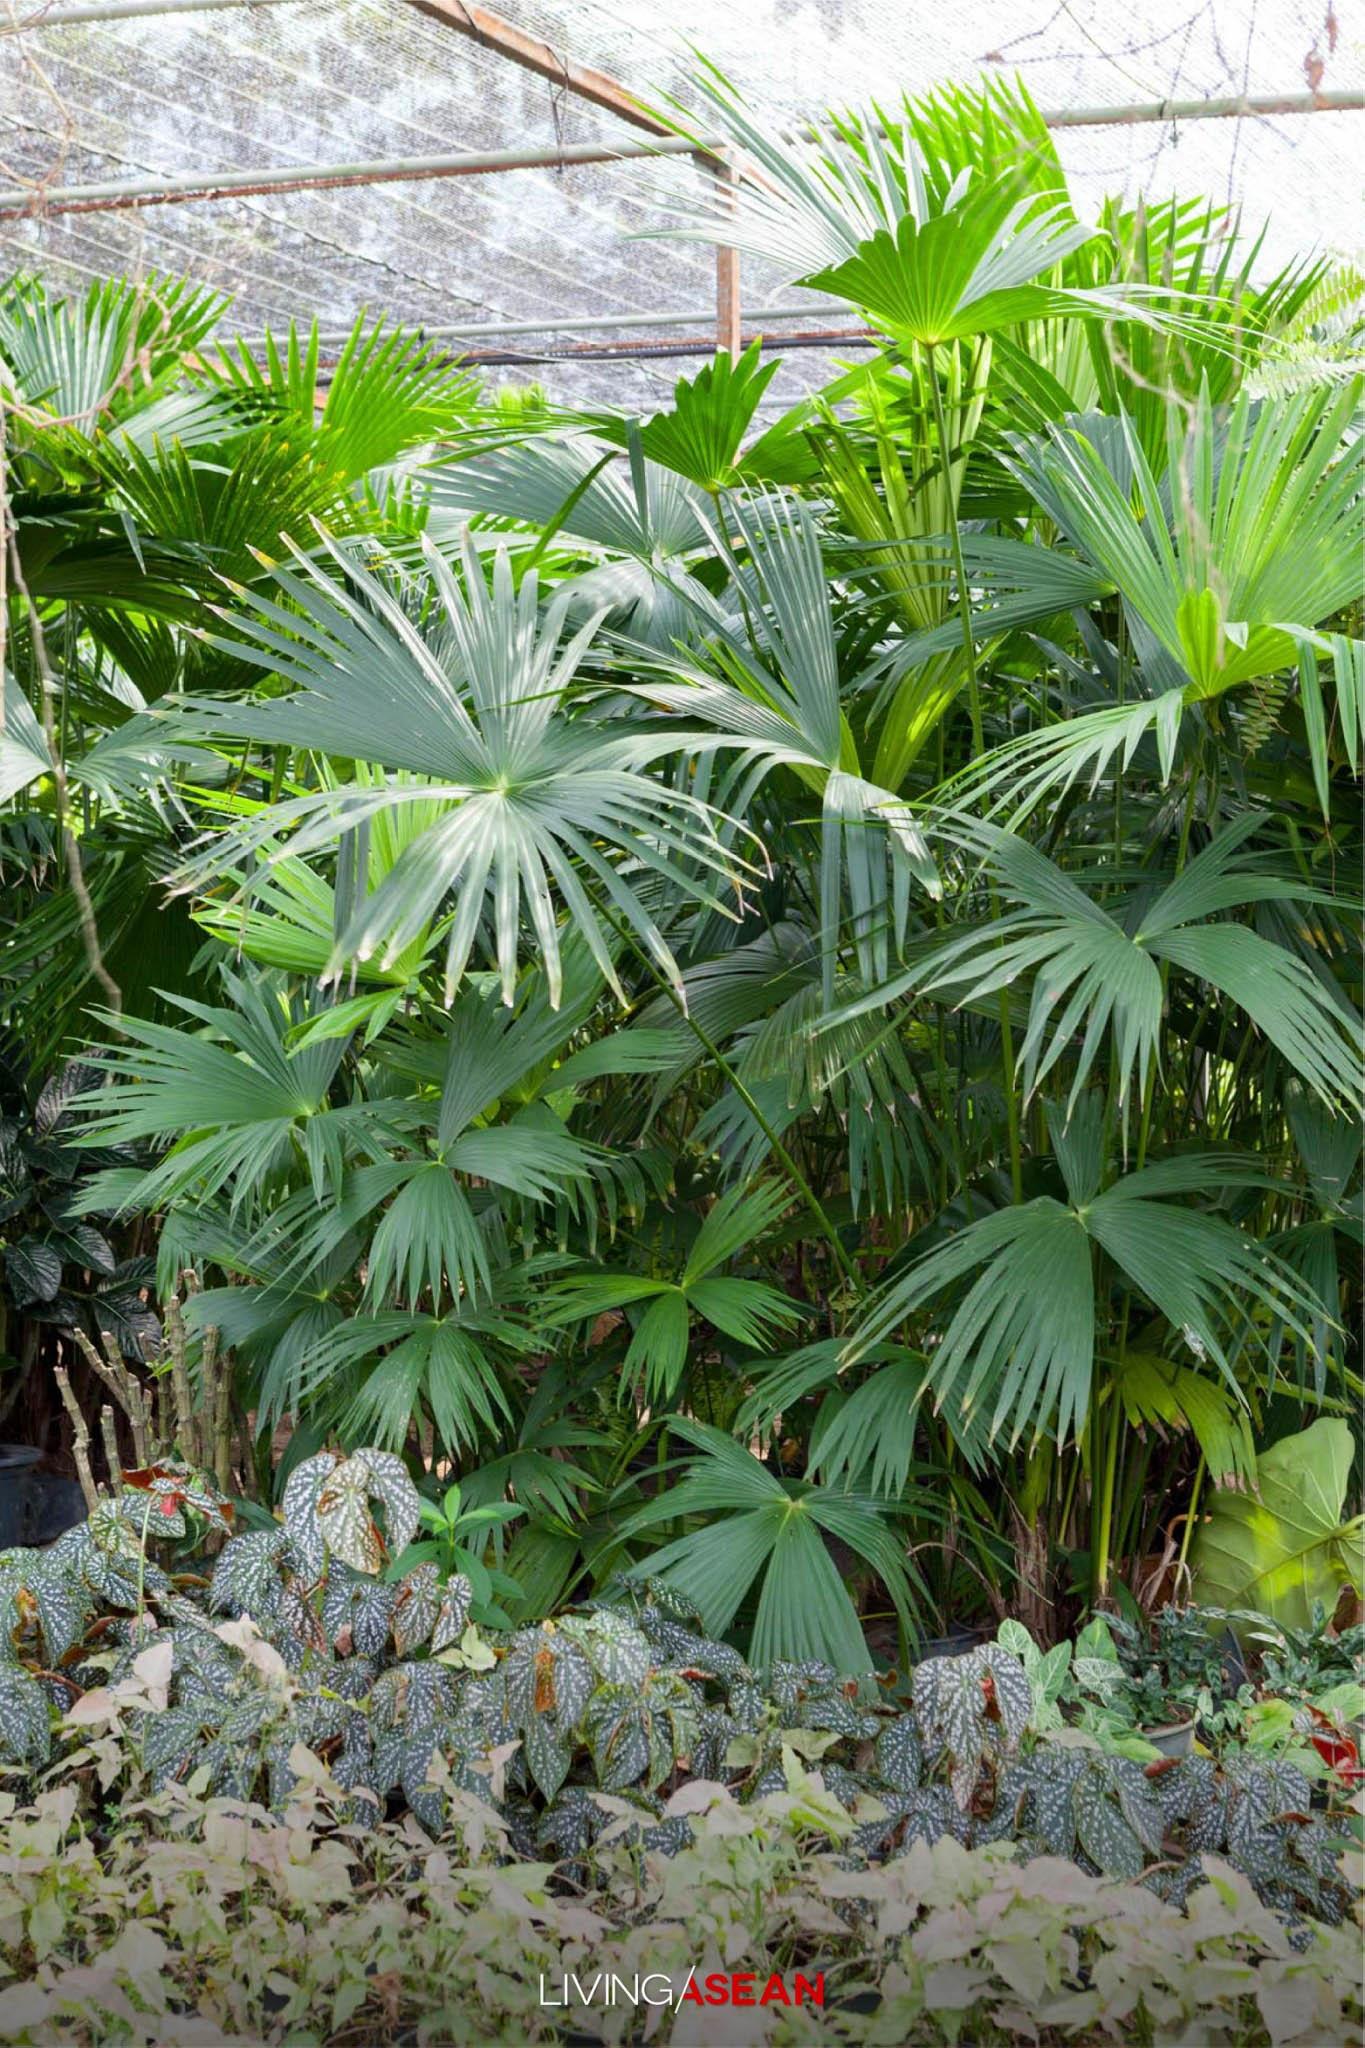 Bensley Design Studios, Botanica Garden, Beautiful Garden, Chiang Mai, Thailand